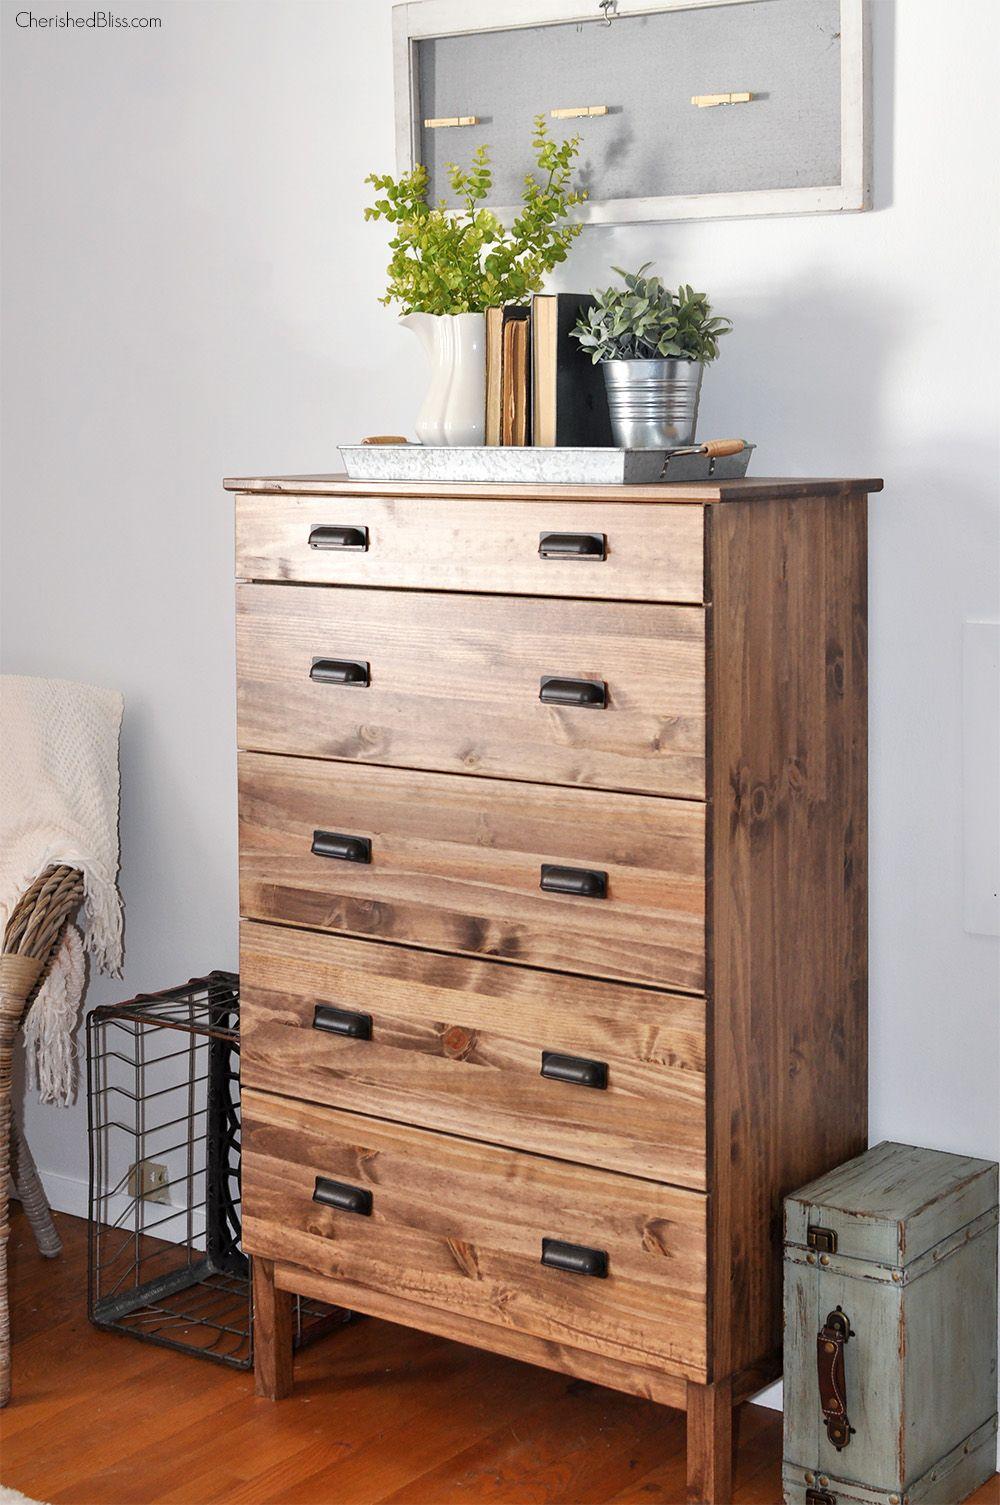 How To Stain An Ikea Tarva Dresser Rustikale Kommode Ikea Diy Und Kommoden Dekorieren